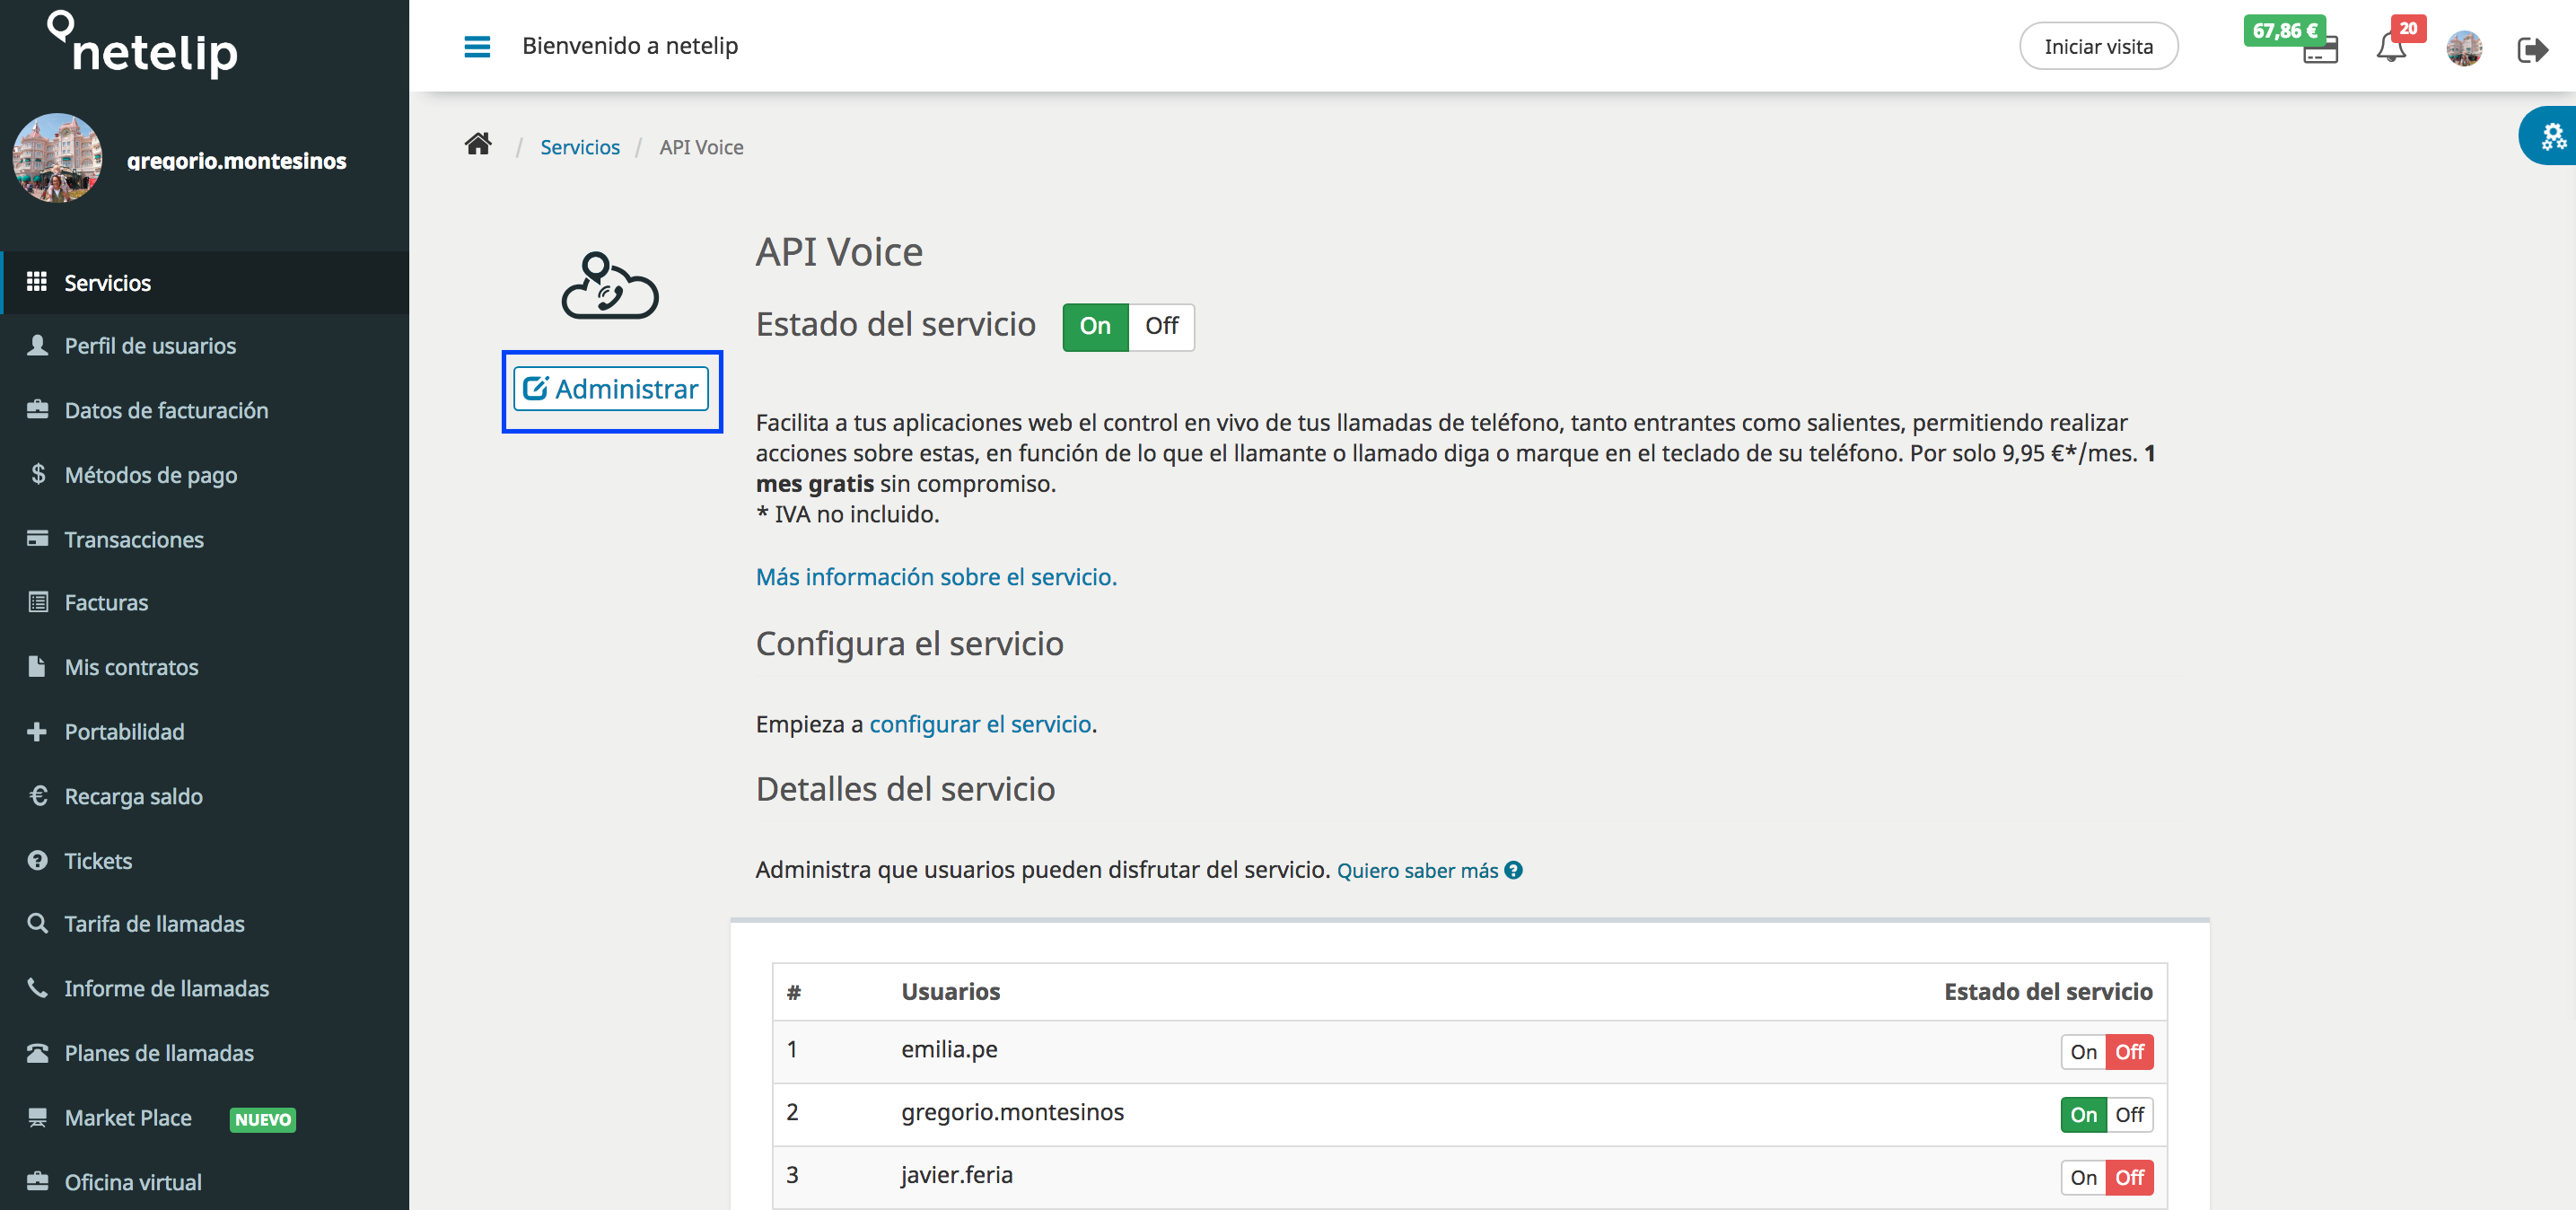 Administrar y gestionar API Voice